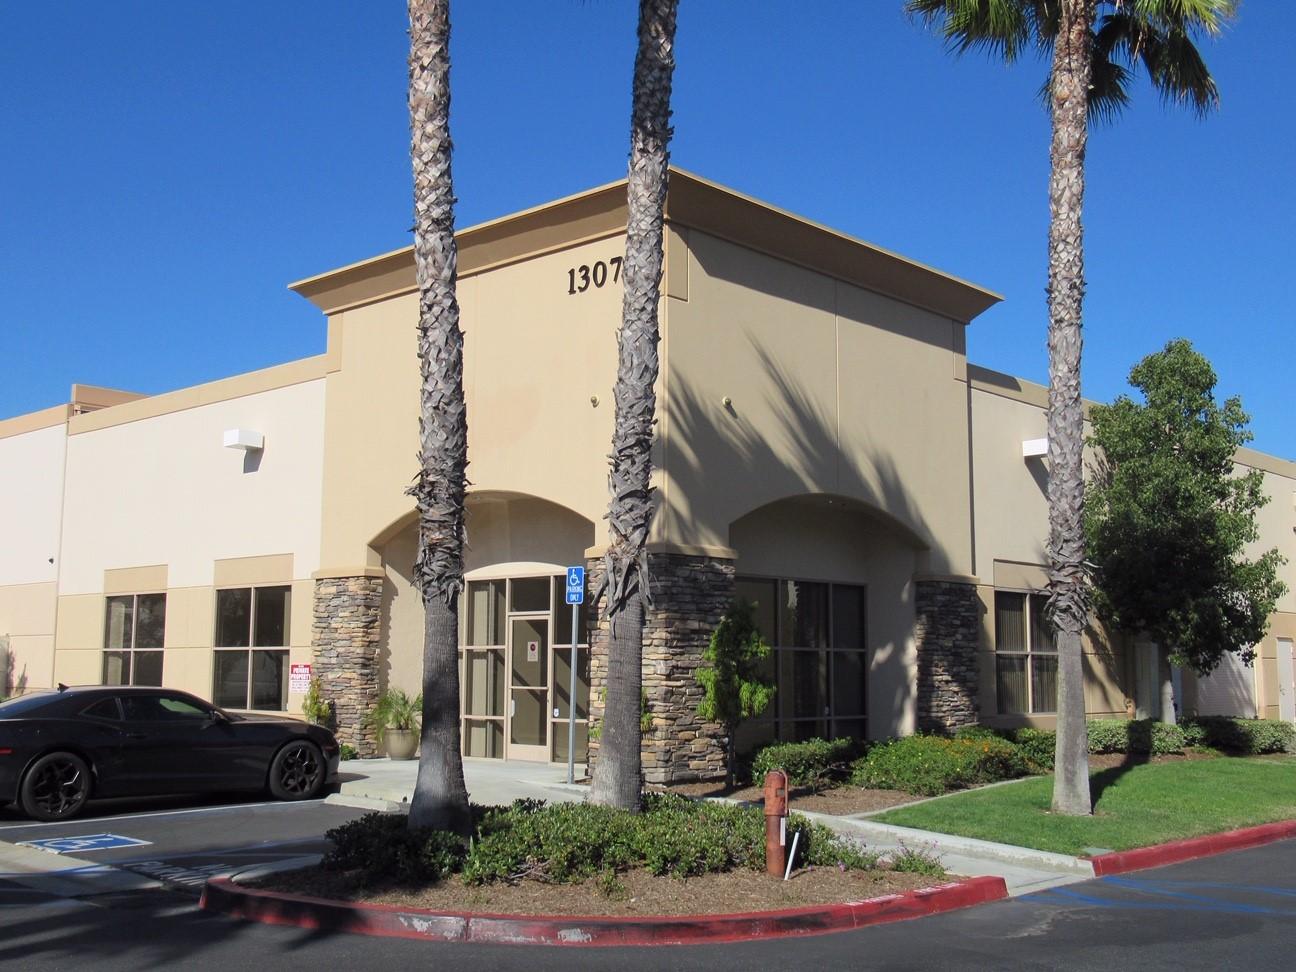 4,106sf Industrial Building for Lease | 1307 Calle Avanzado, San Clemente